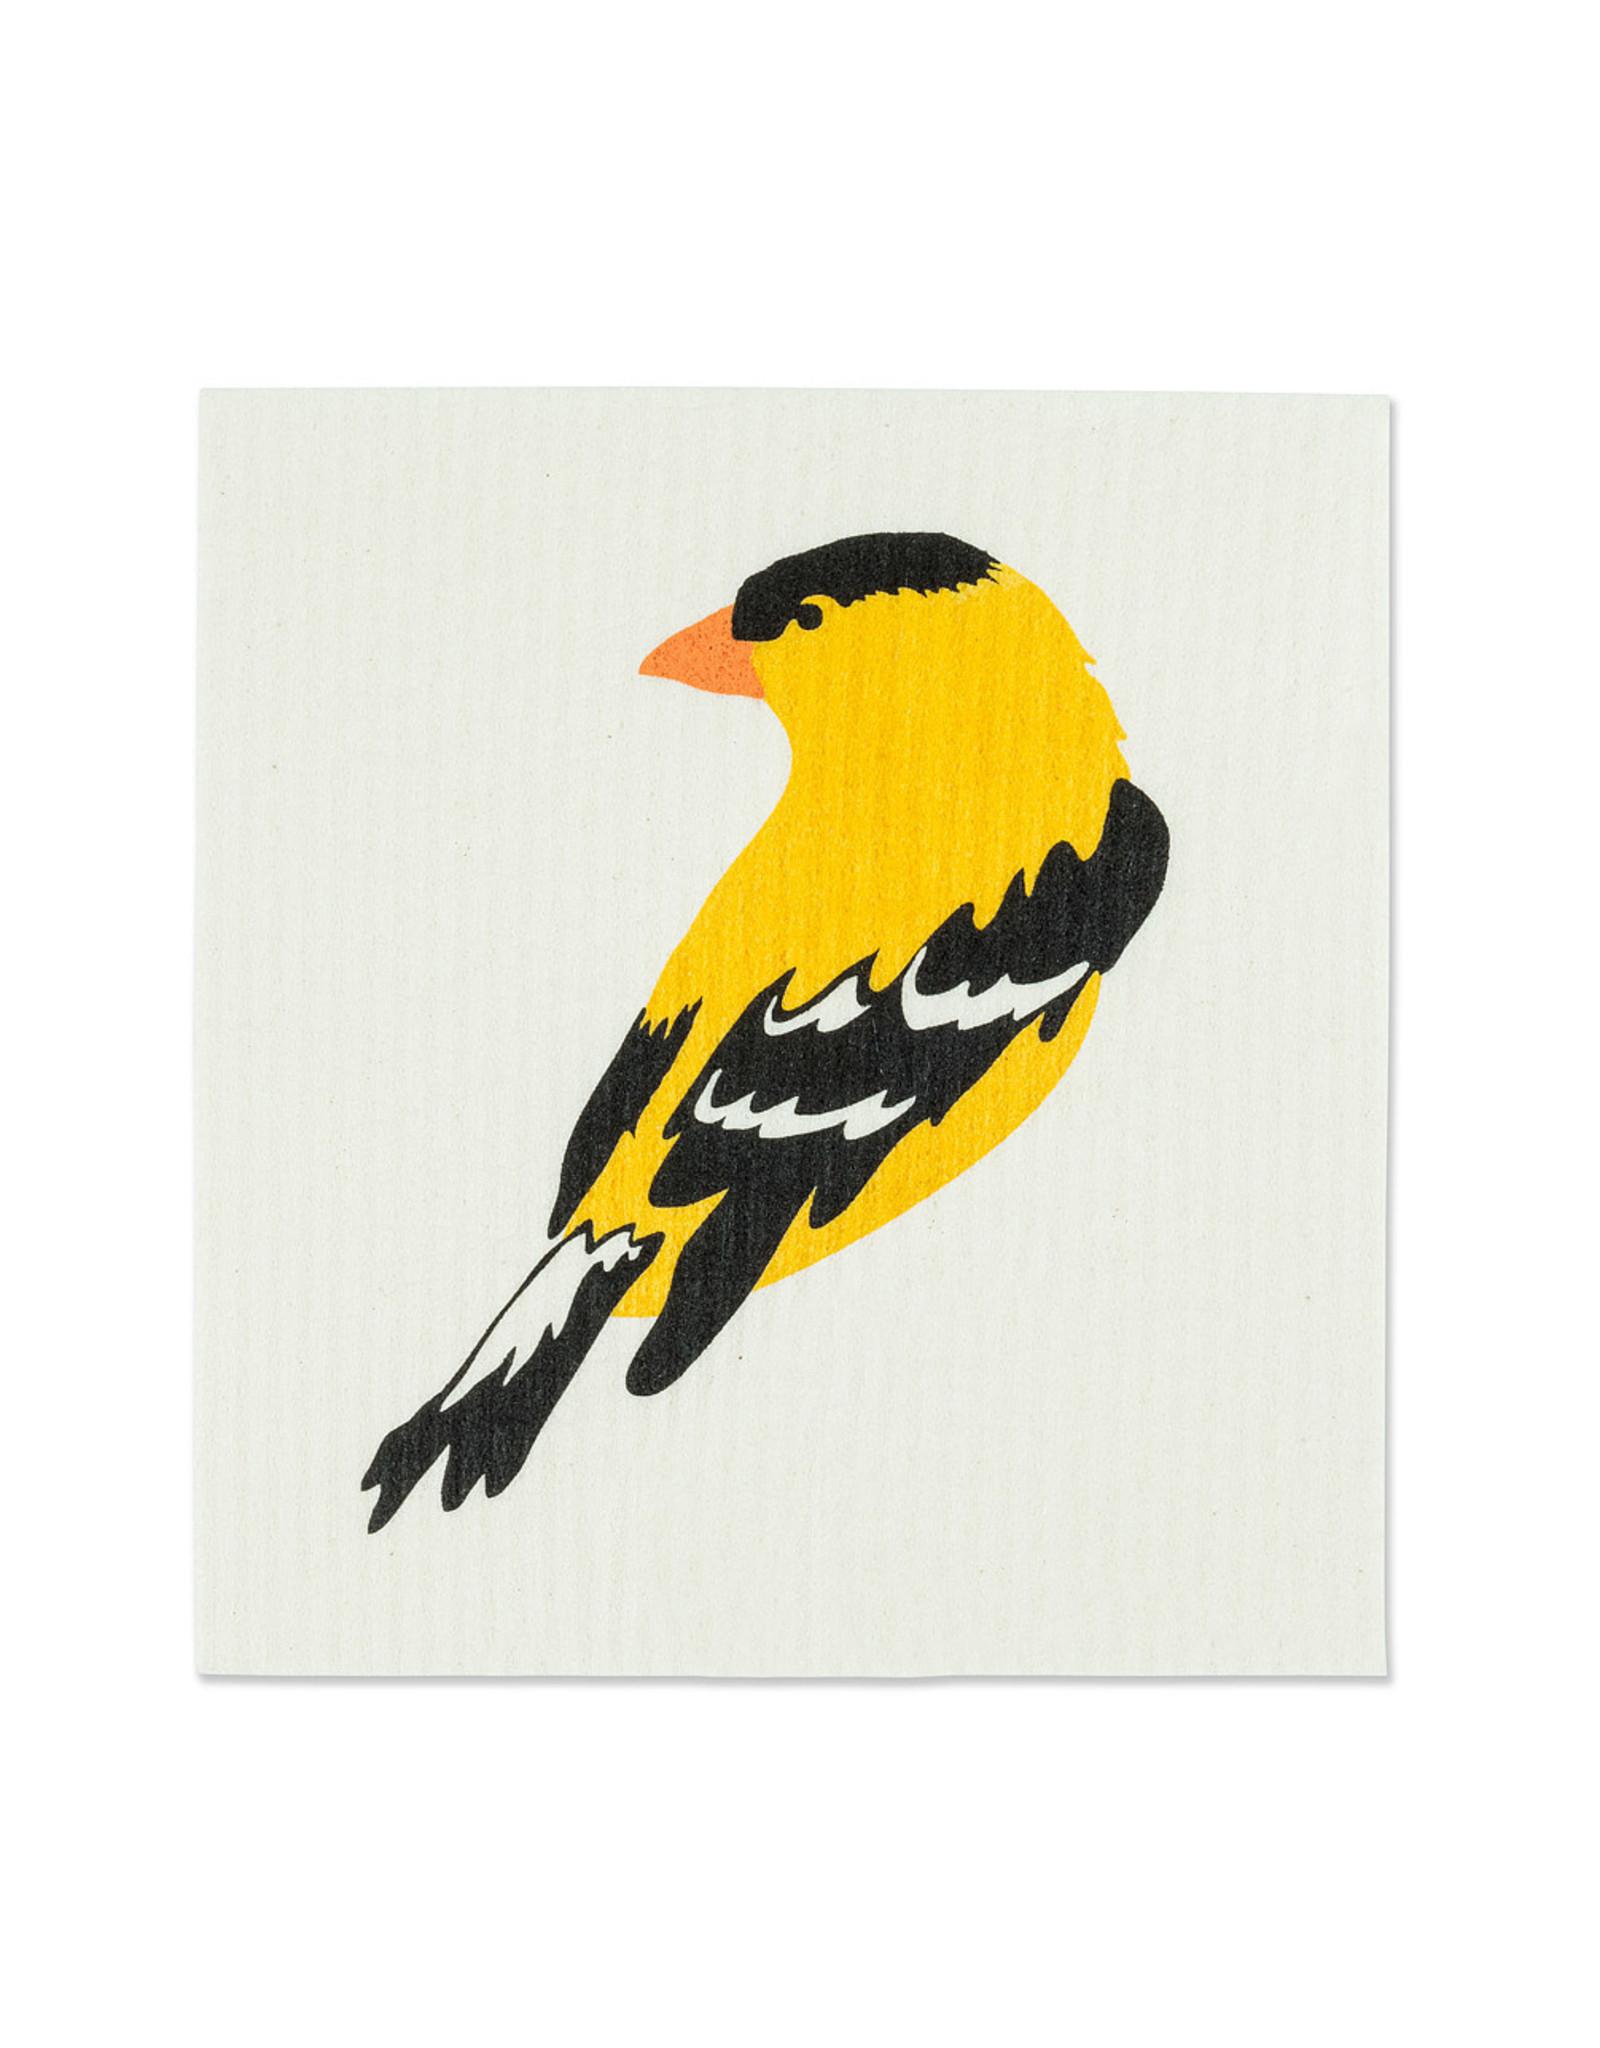 ATT - Swedish Dishcloth / One Finch